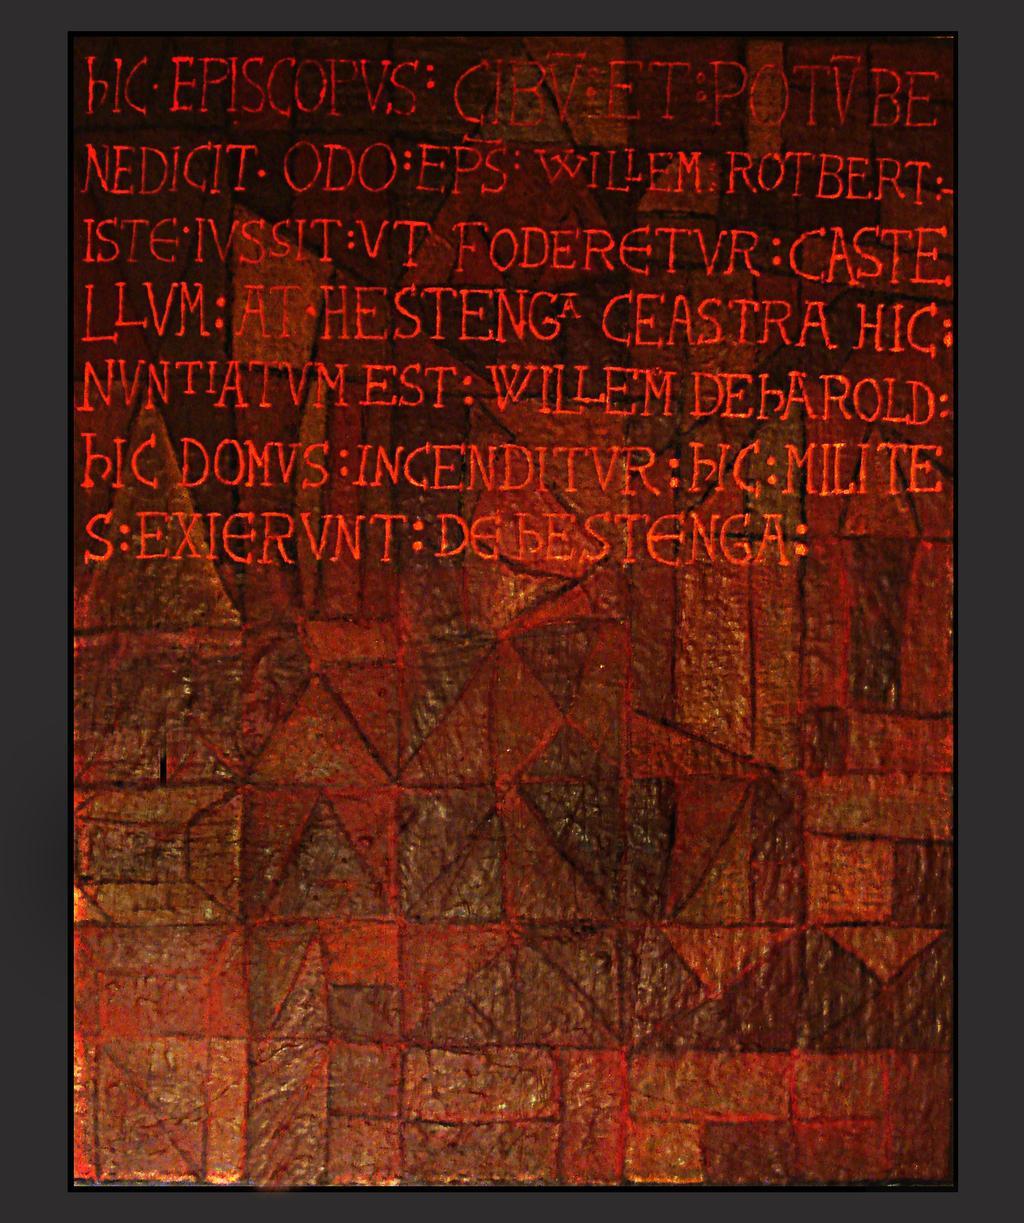 hic episcopus updated 2 by comteskyee